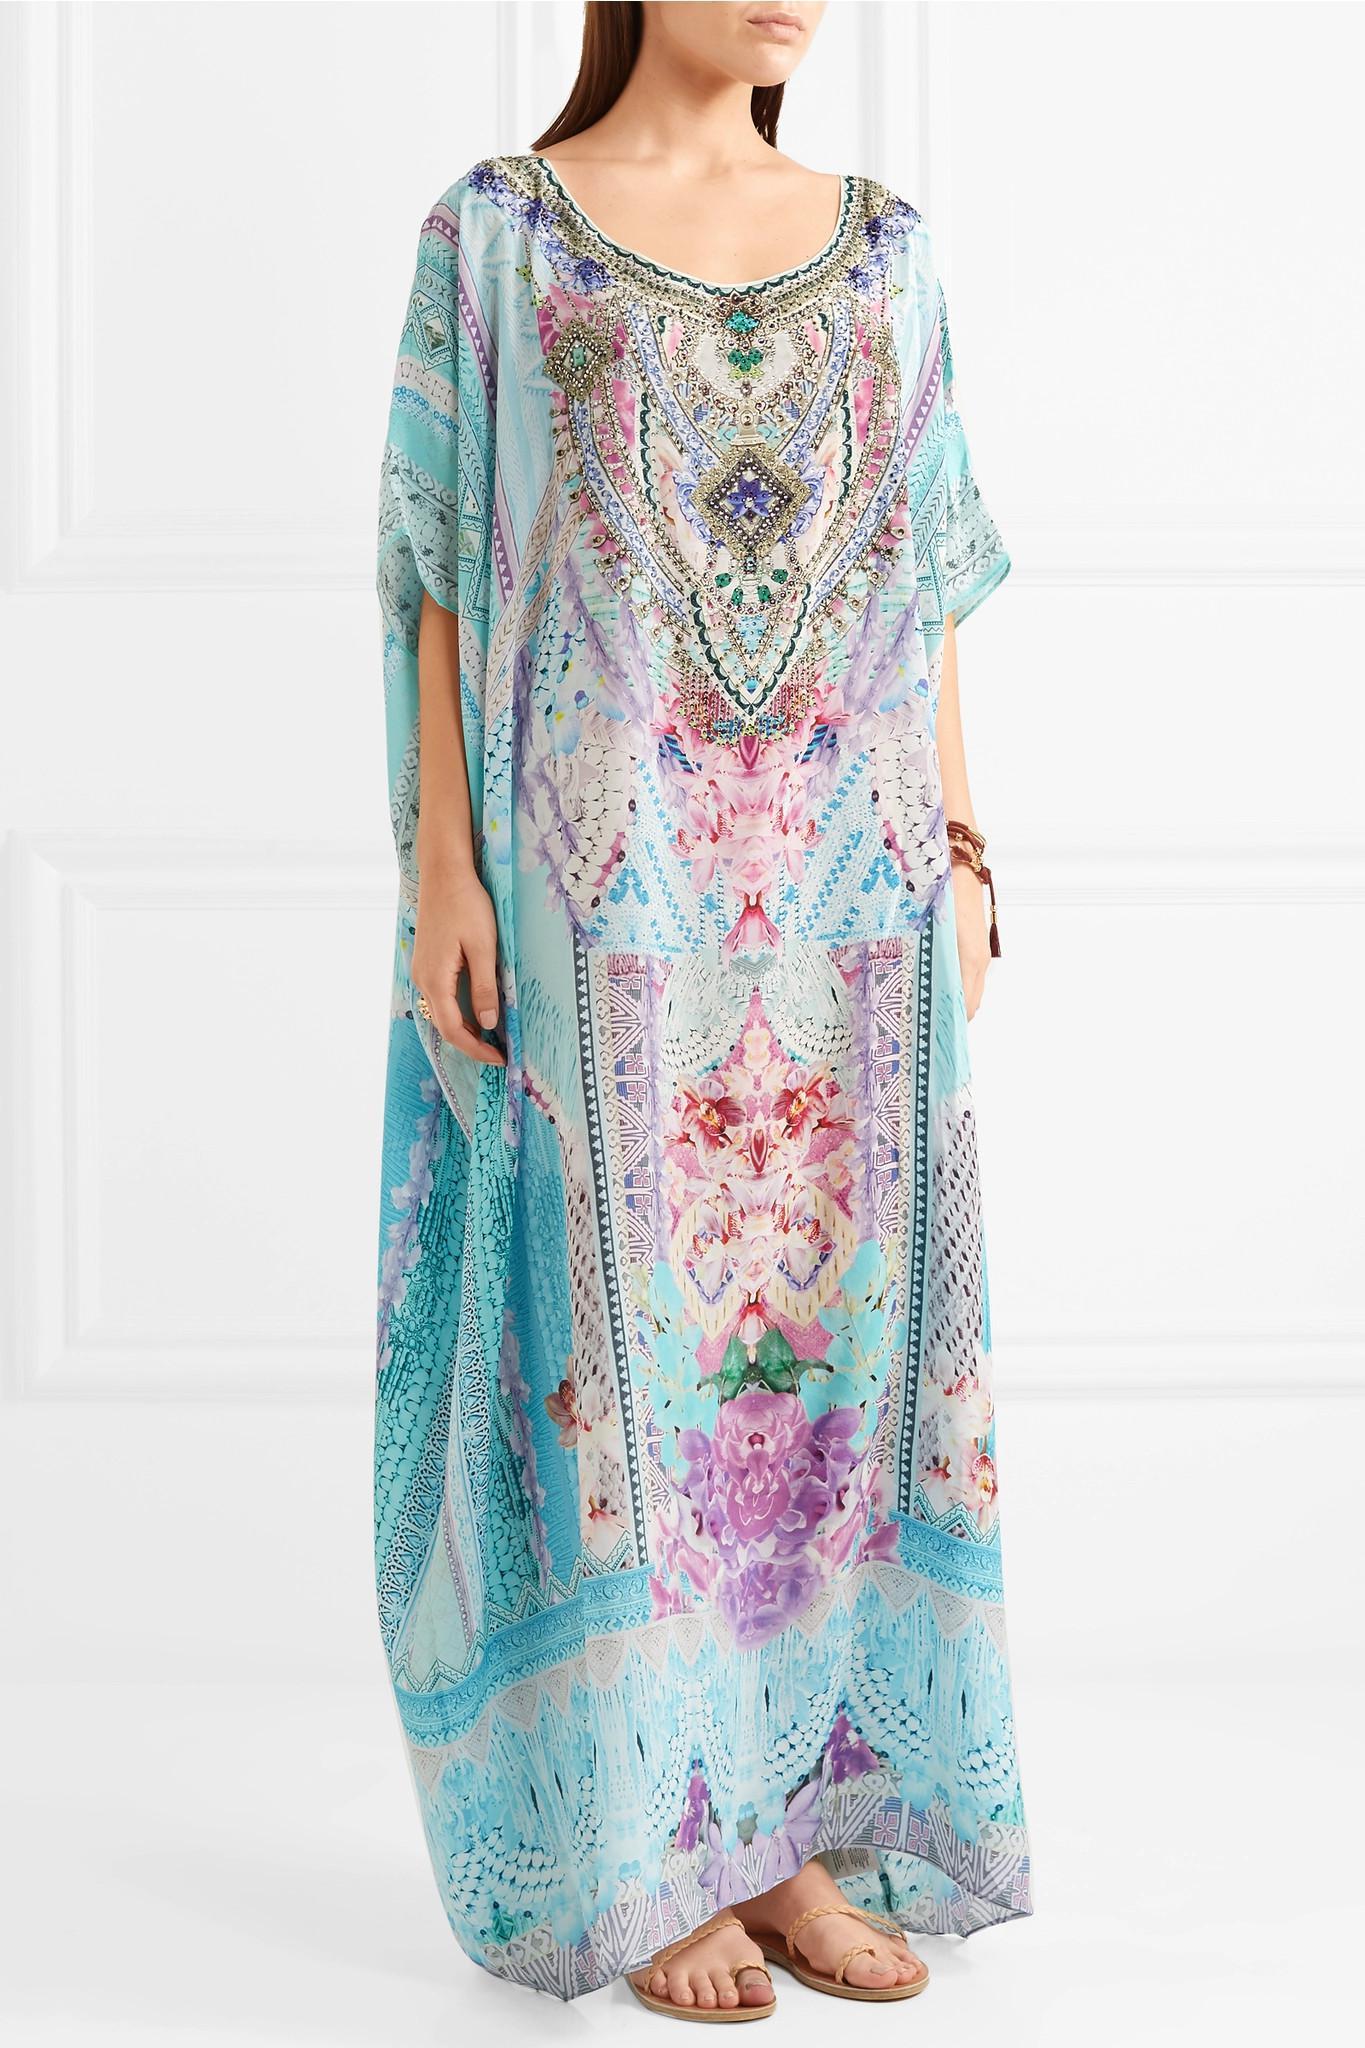 Rio Embellished Printed Silk Crepe De Chine Kaftan - Blue Camilla 6jCN3sjVYw